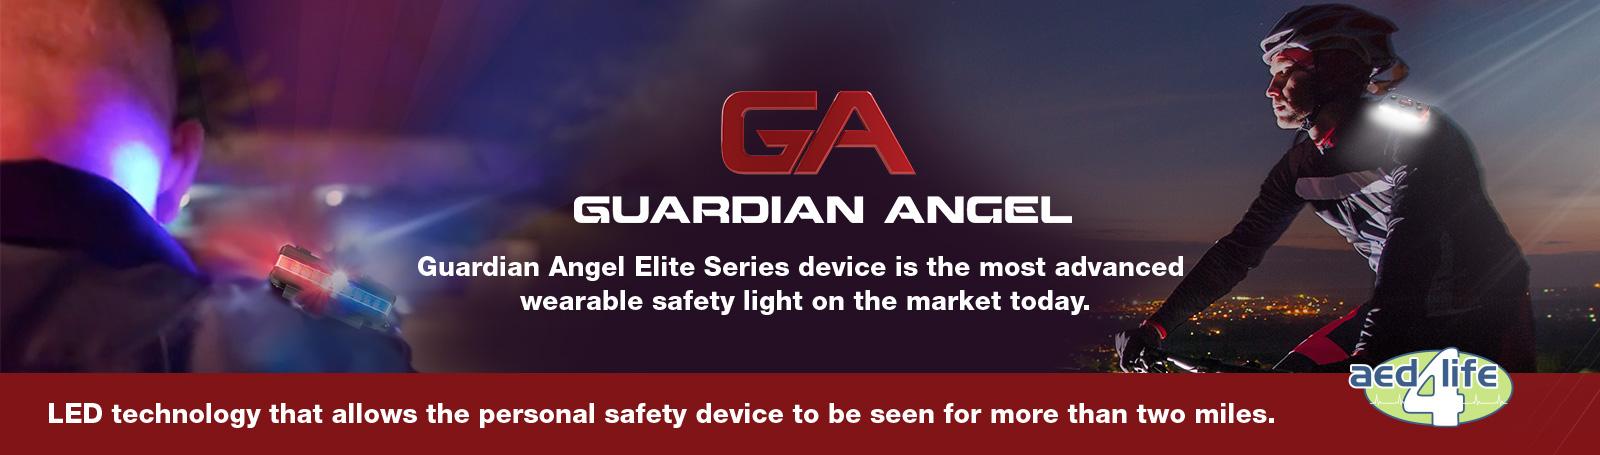 Guardian Angel Lights